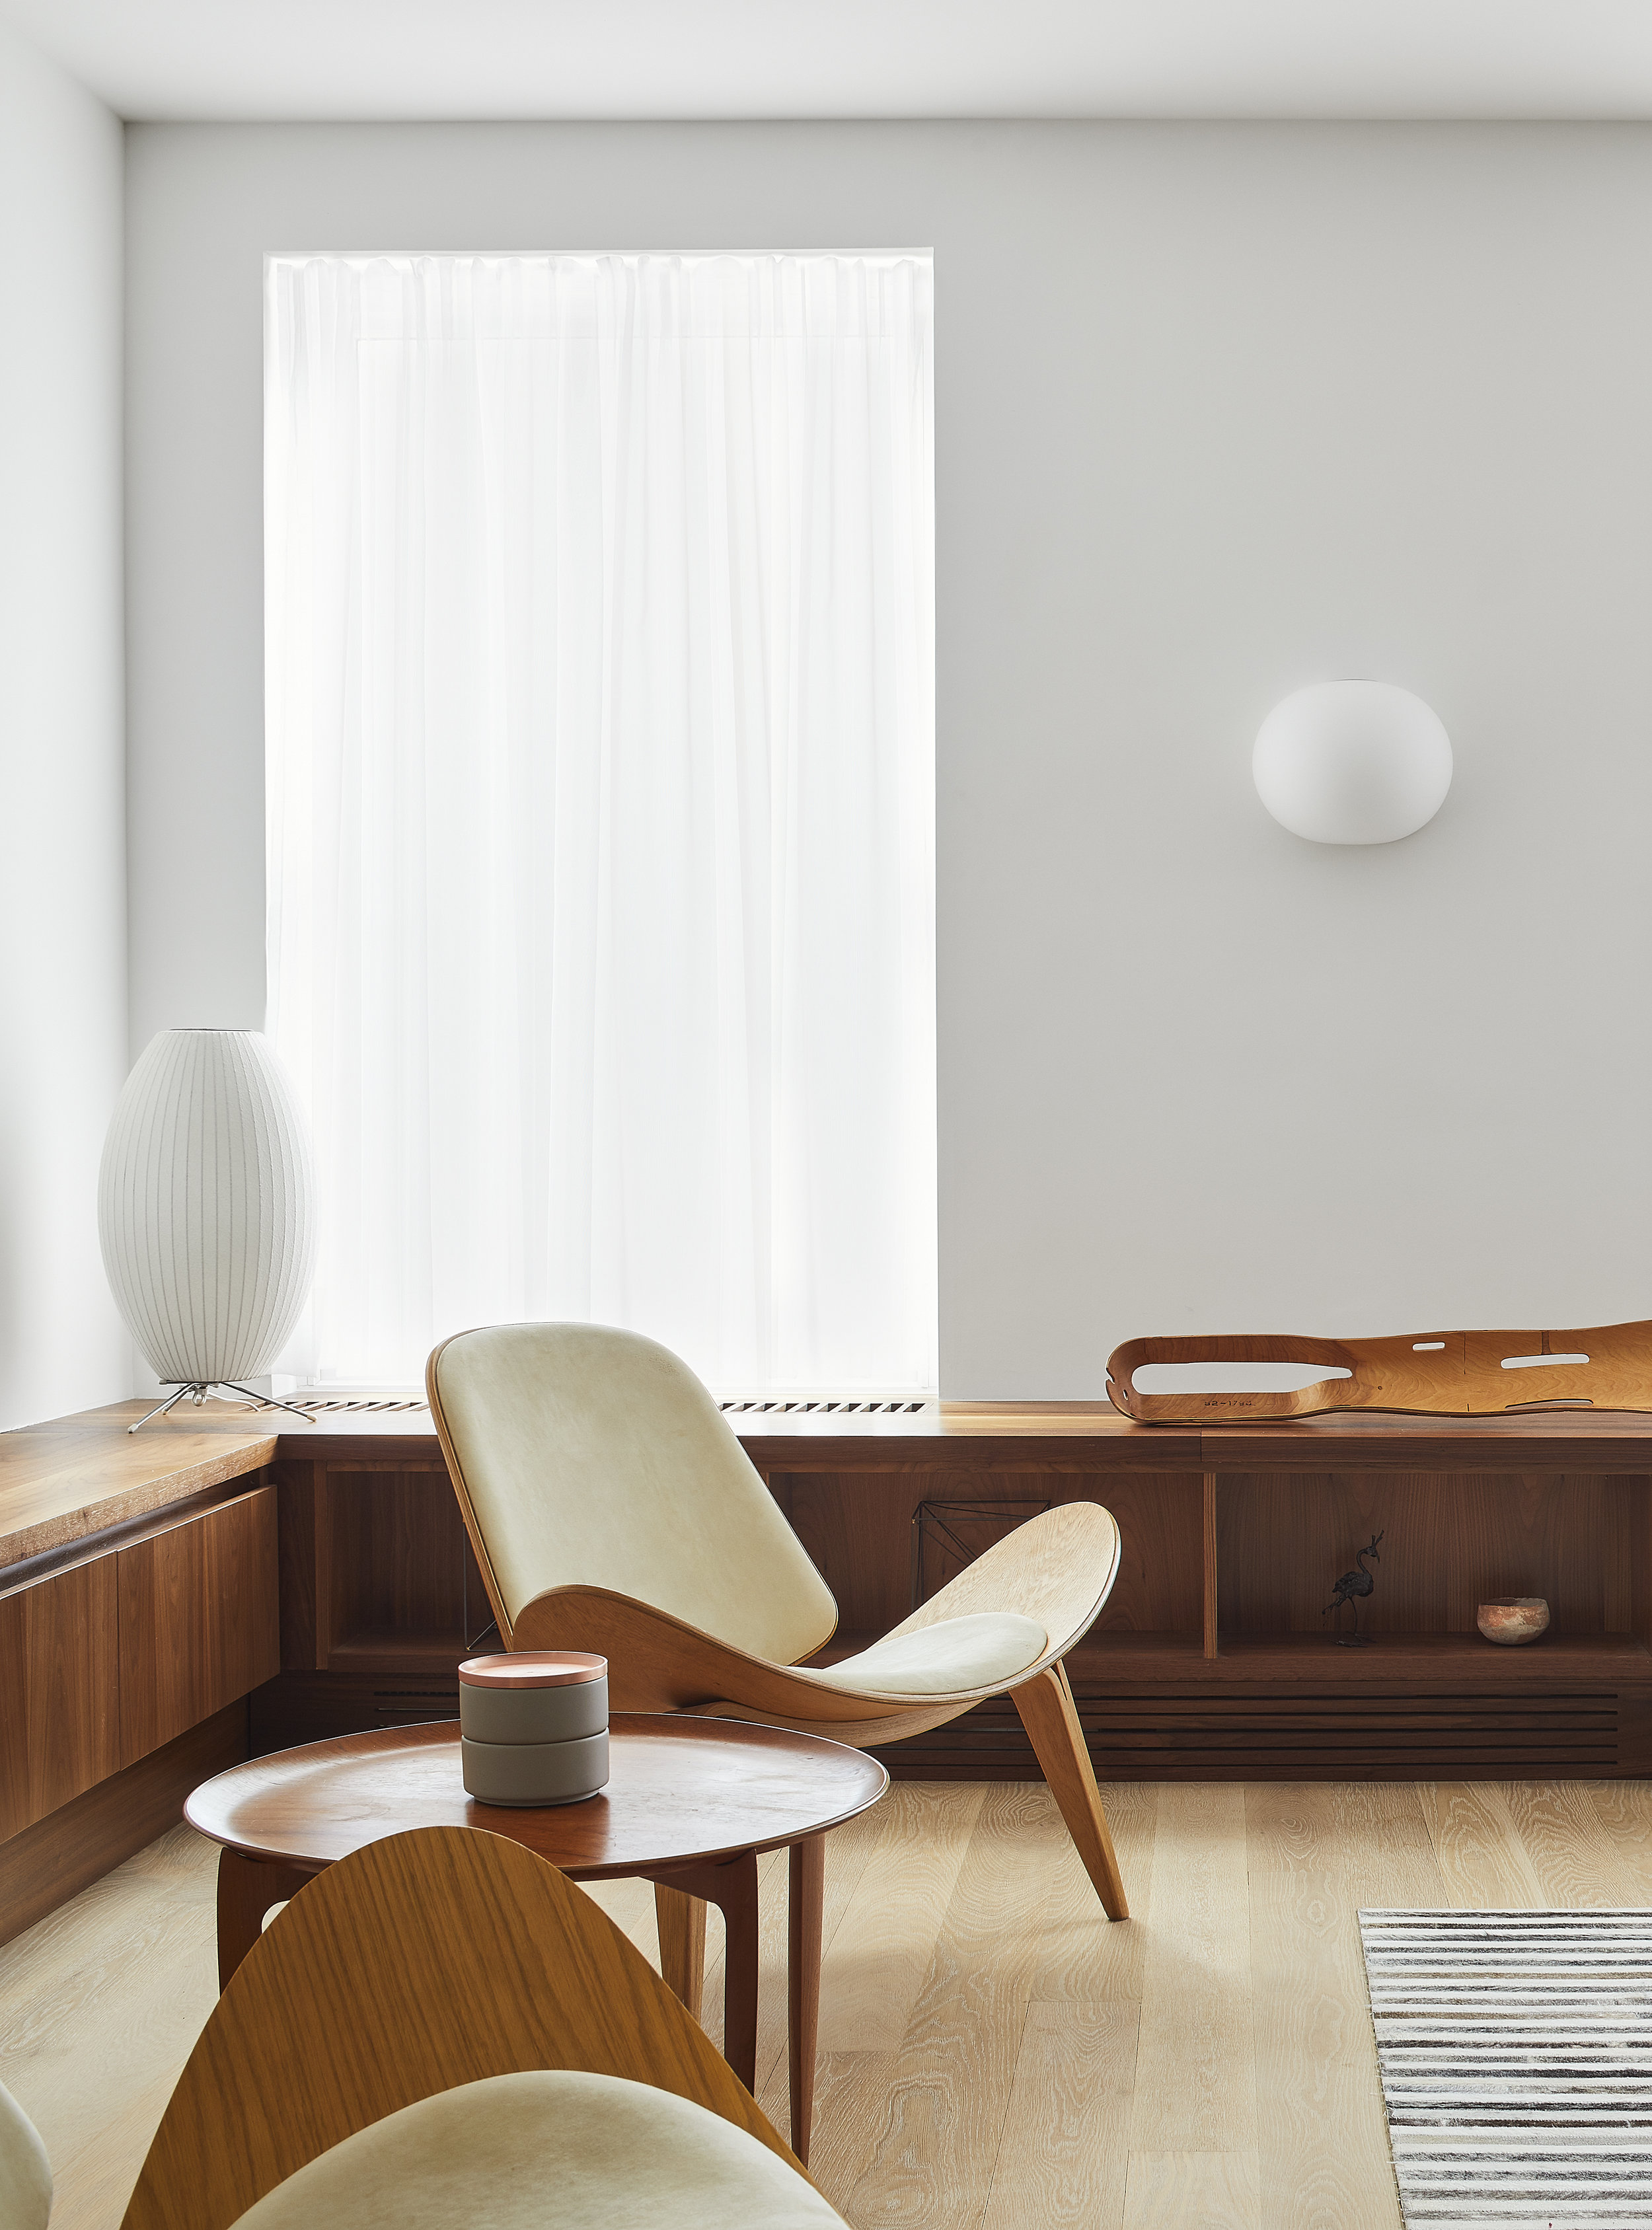 turkel_design_modern_prefab_home_soho_loft_interior_detail.jpg